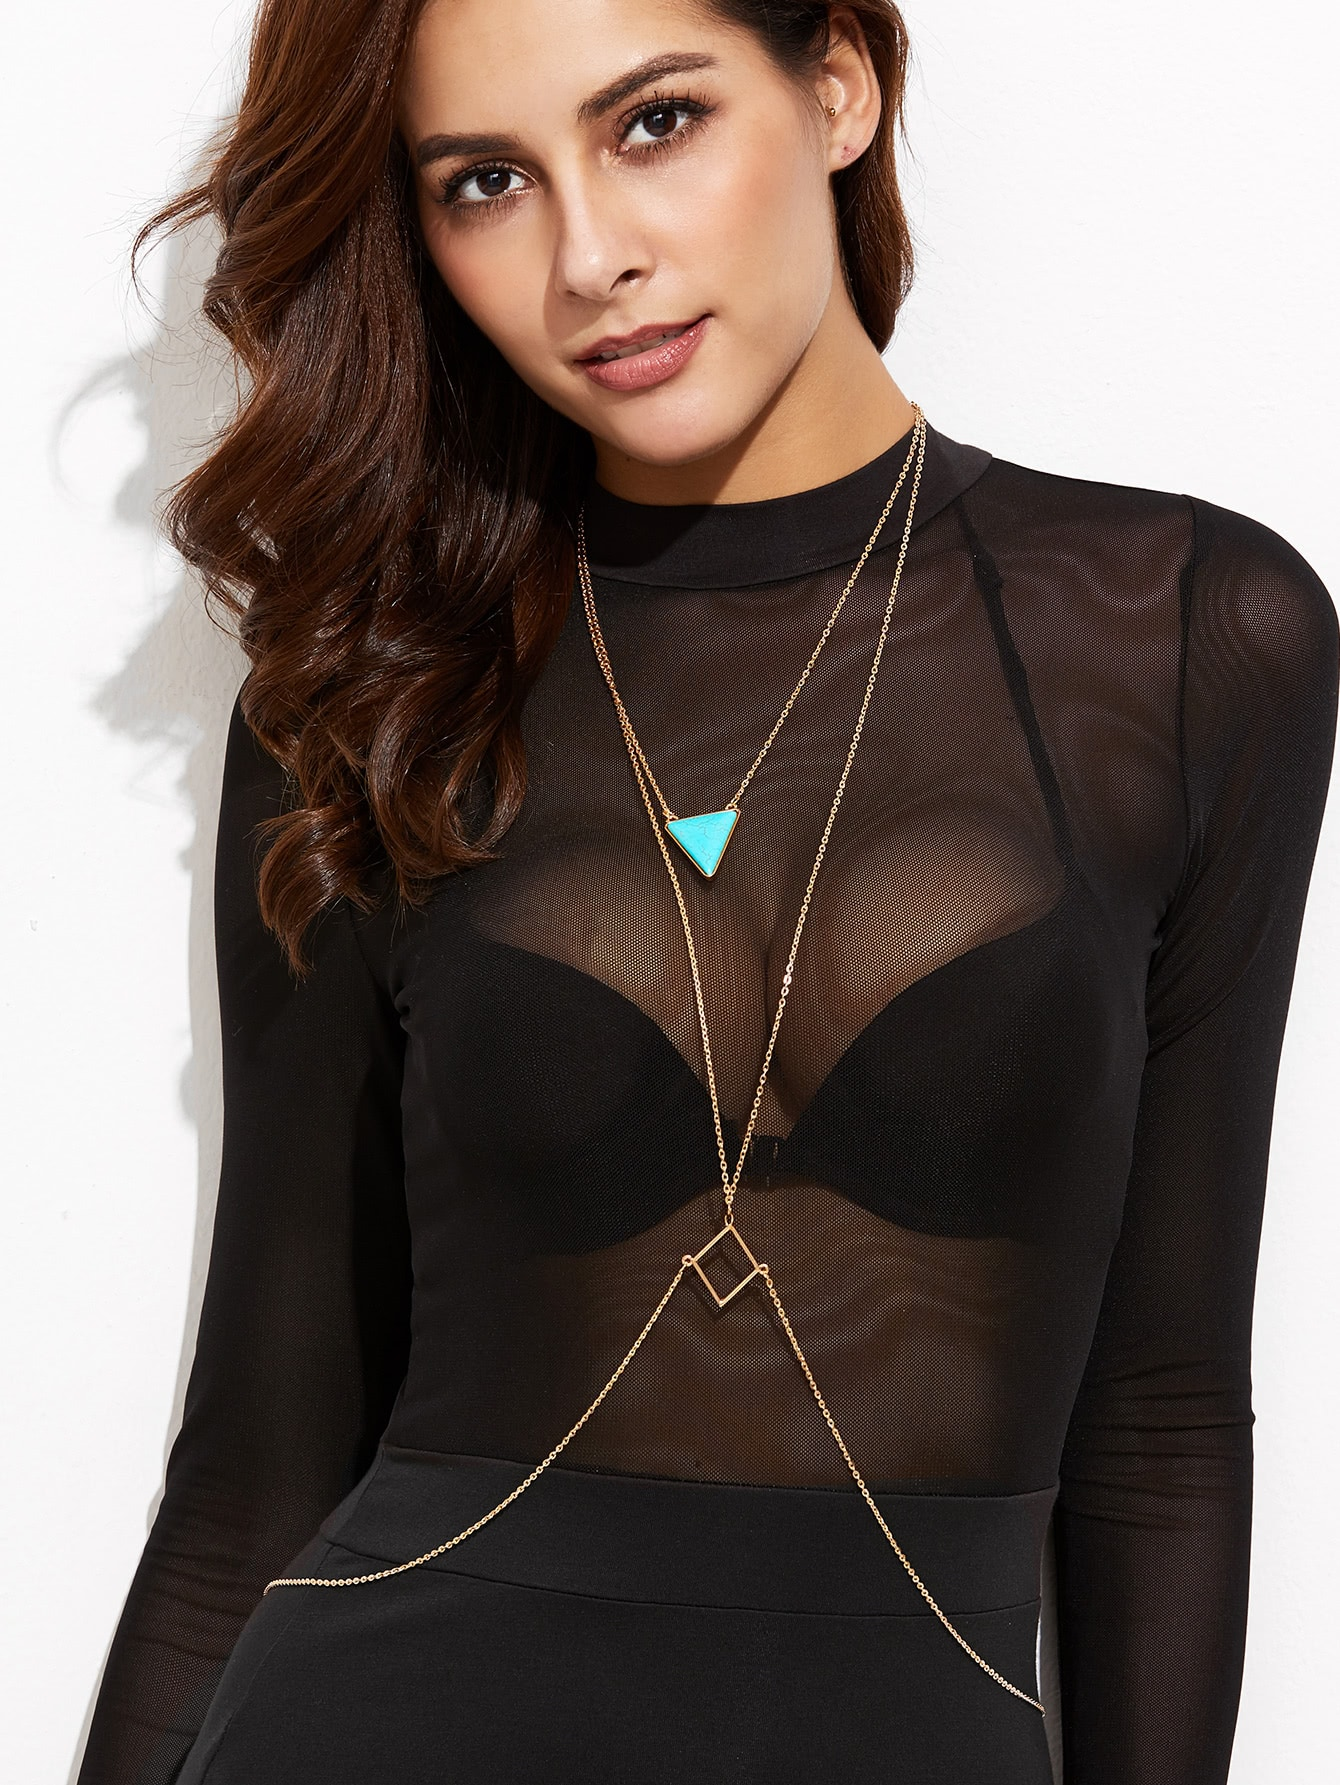 Layered Geometric Turquoise Body Chain